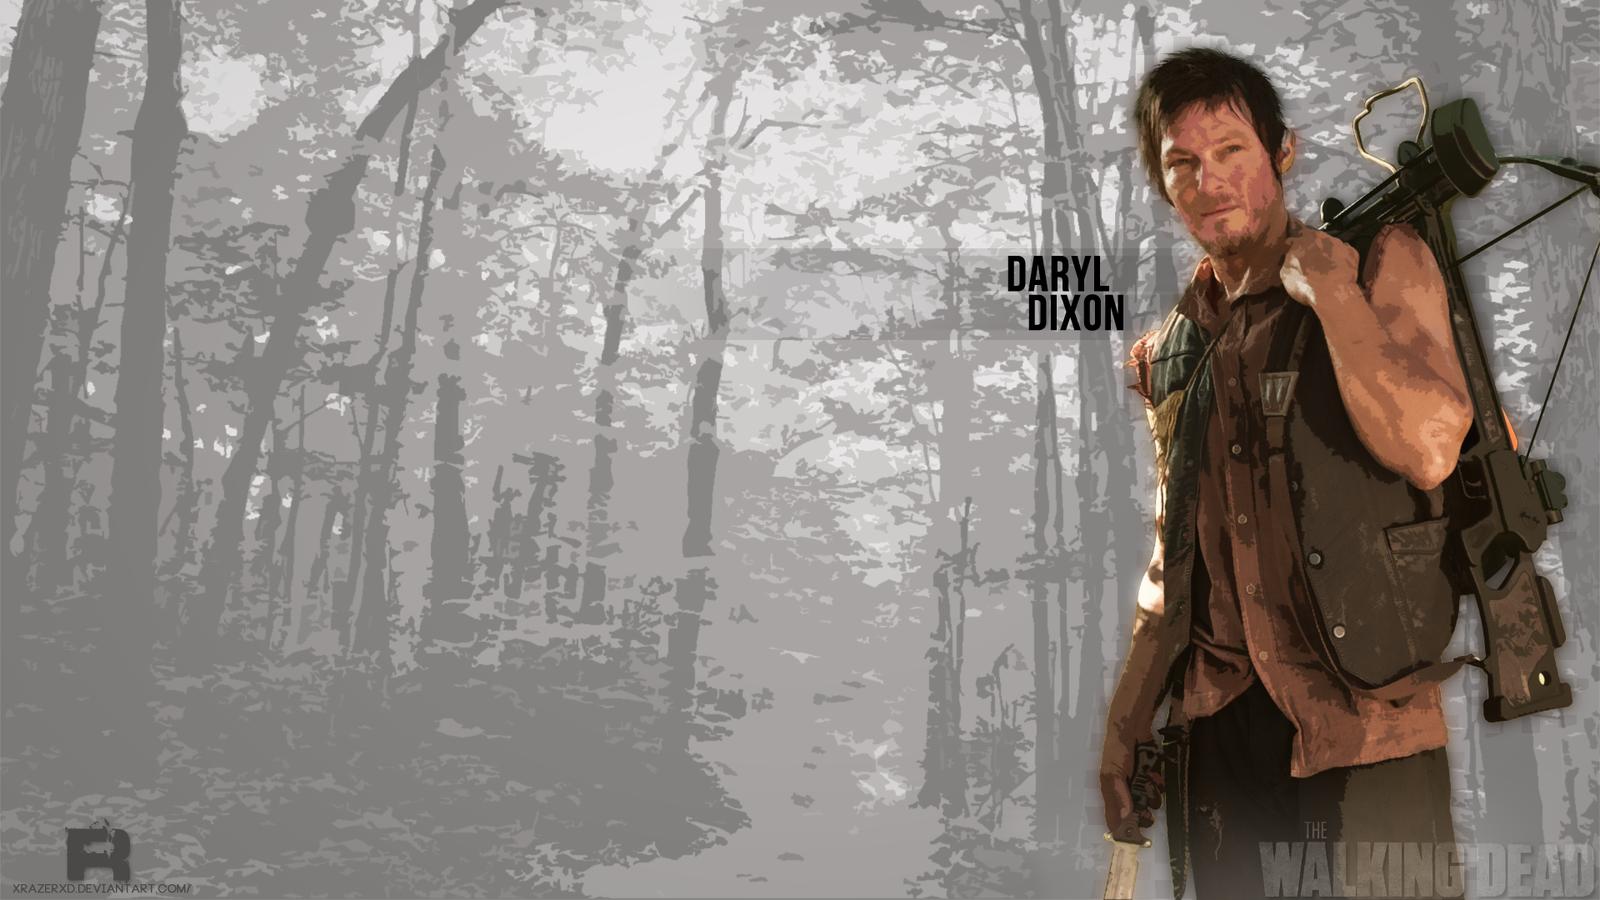 ... The Walking Dead : Daryl Dixon #REMAKE by xRazerxD